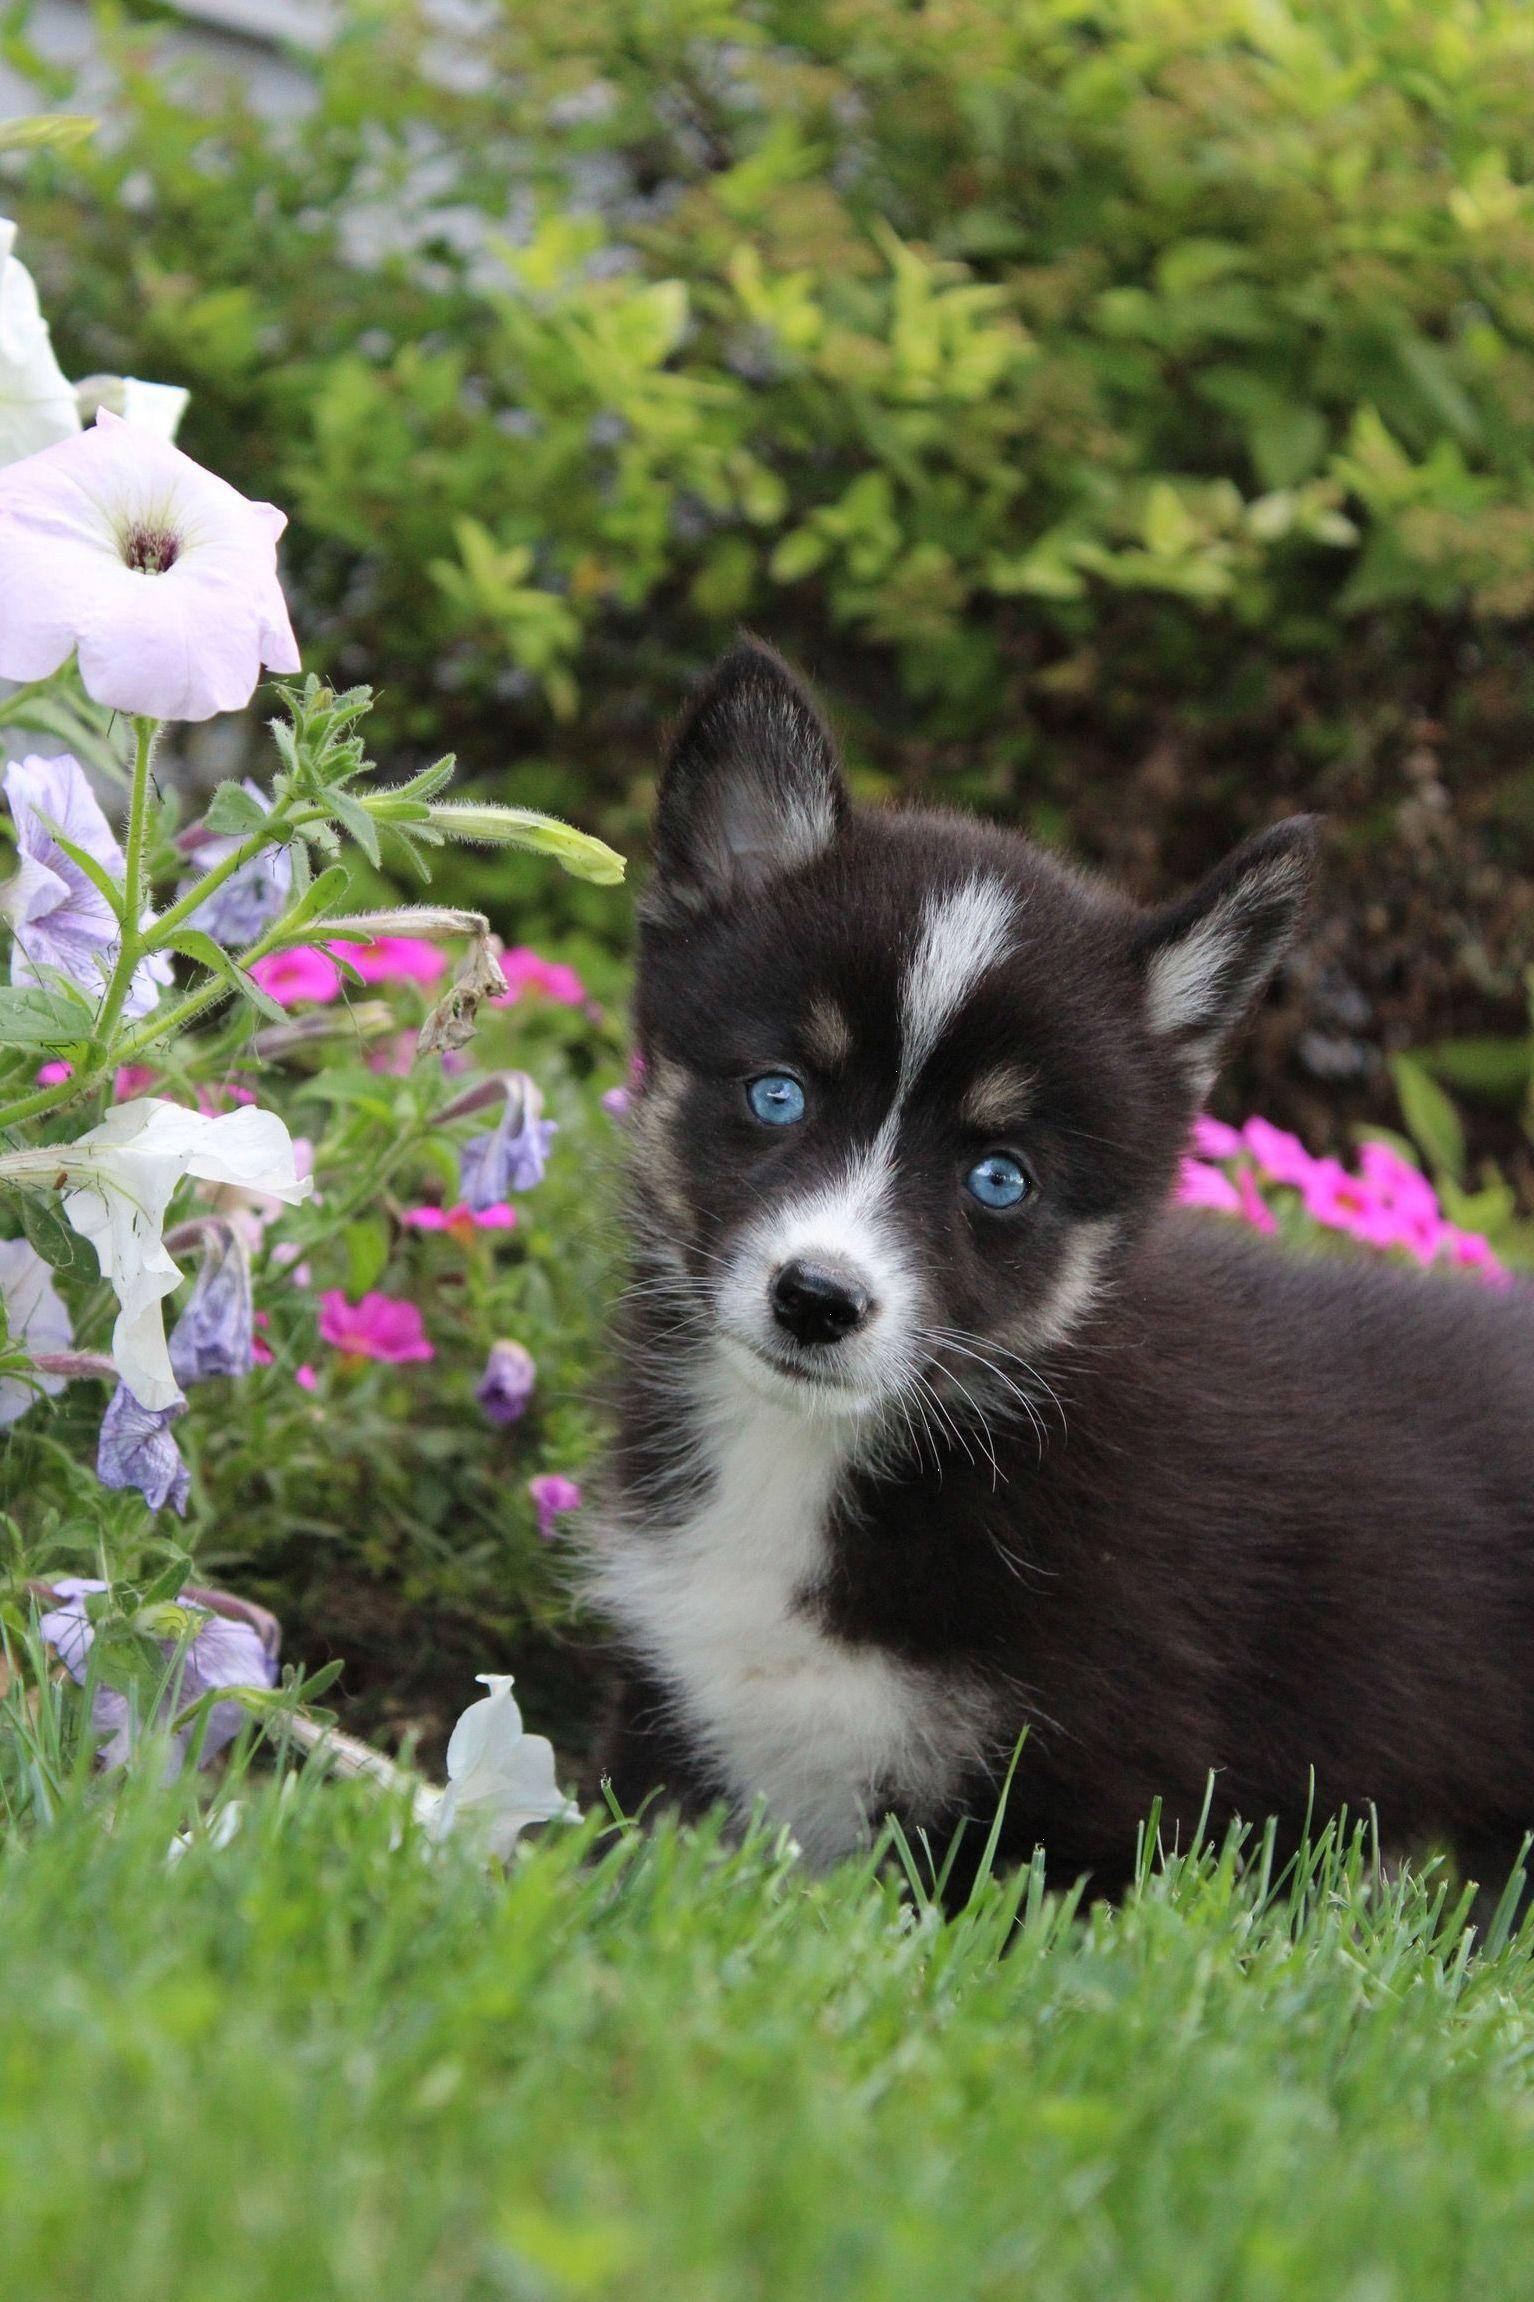 12 Cute Pomsky Dog Breed Ideas In 2020 Pomsky Puppies For Sale Pomsky Puppies Puppies For Sale